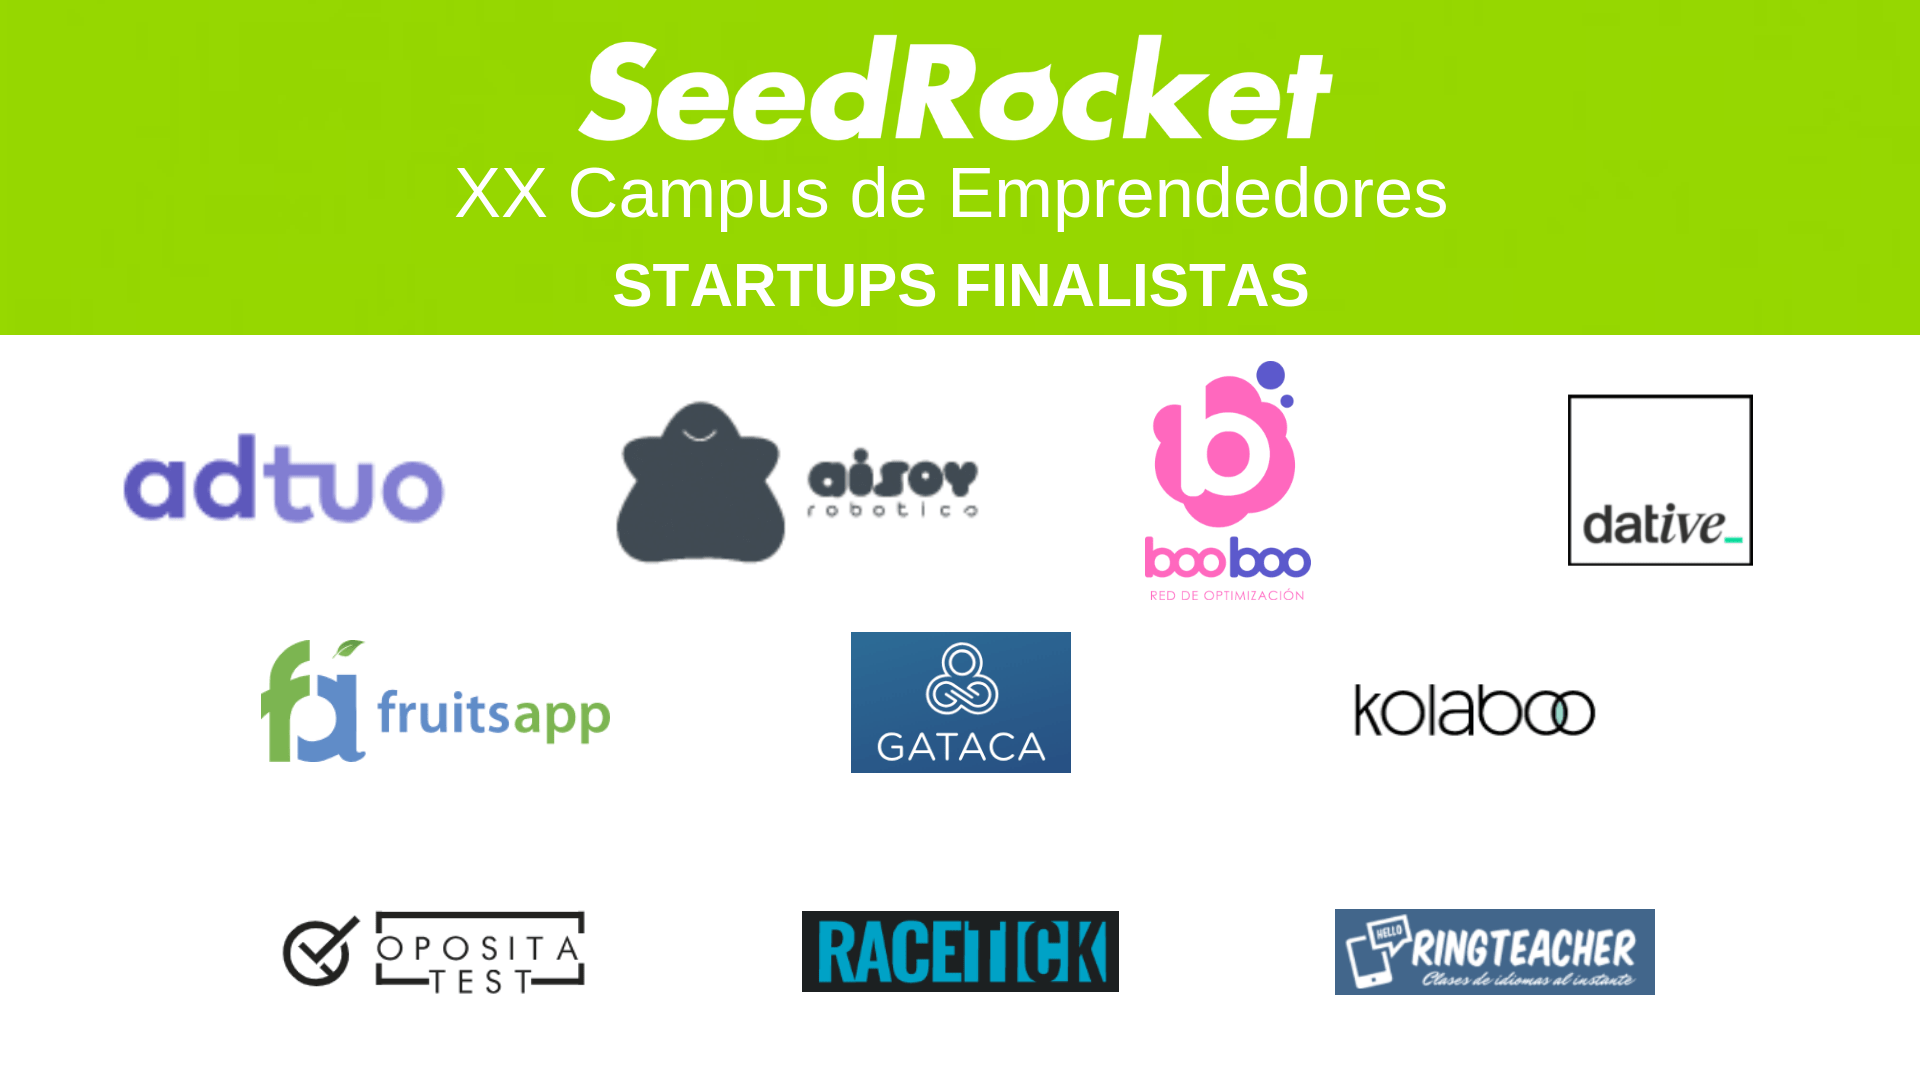 20181030_Finalistas_XX Campus de Emprendedores.img